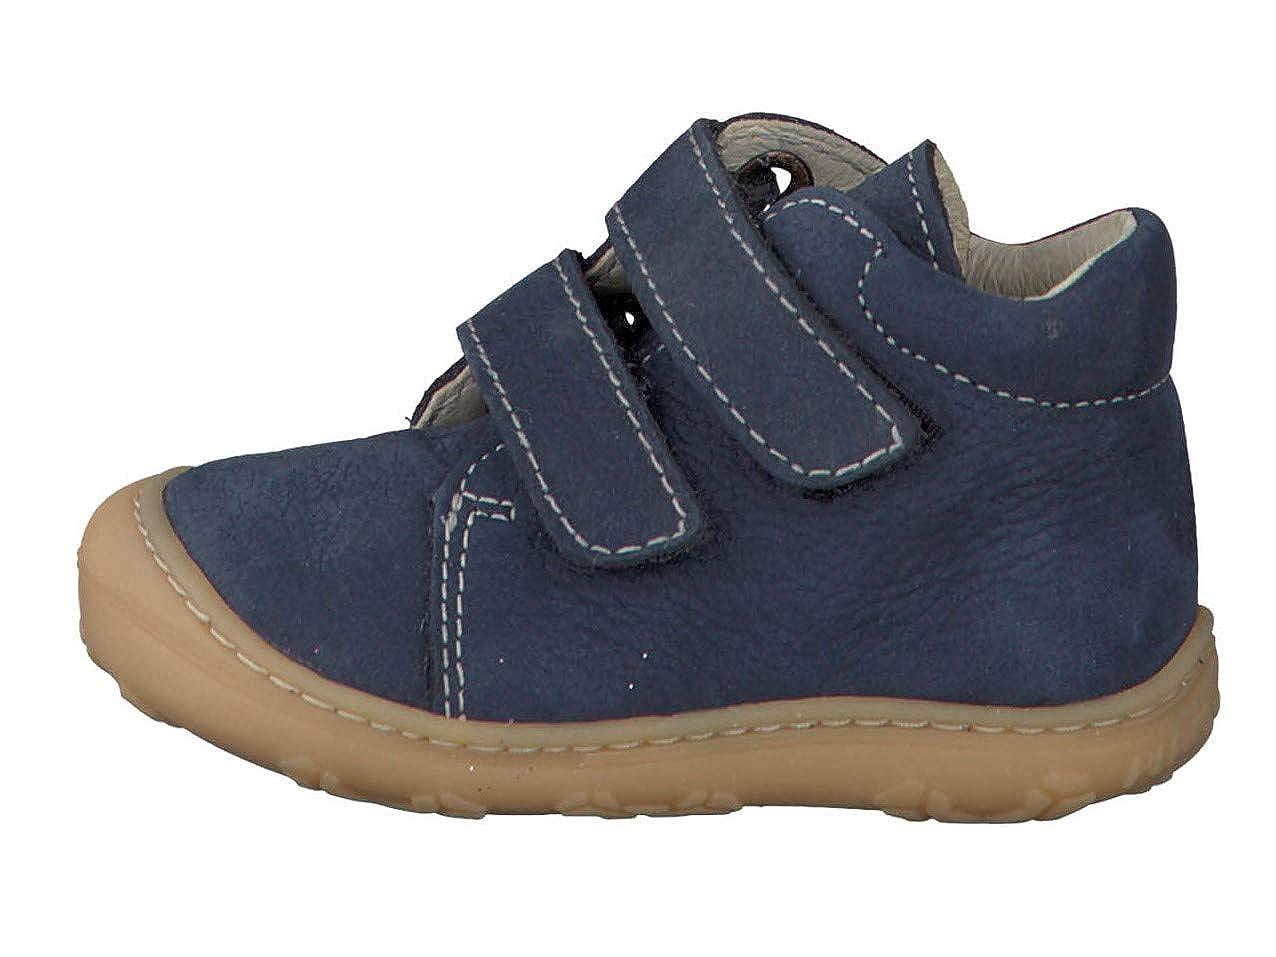 RICOSTA Pepino by Unisex WMS: Mittel Klettstiefel Leder Kind-er Kids junior Kleinkind-er Kinder-Schuhe,See,24 EU // 7 UK Kinder Stiefel Chrisy